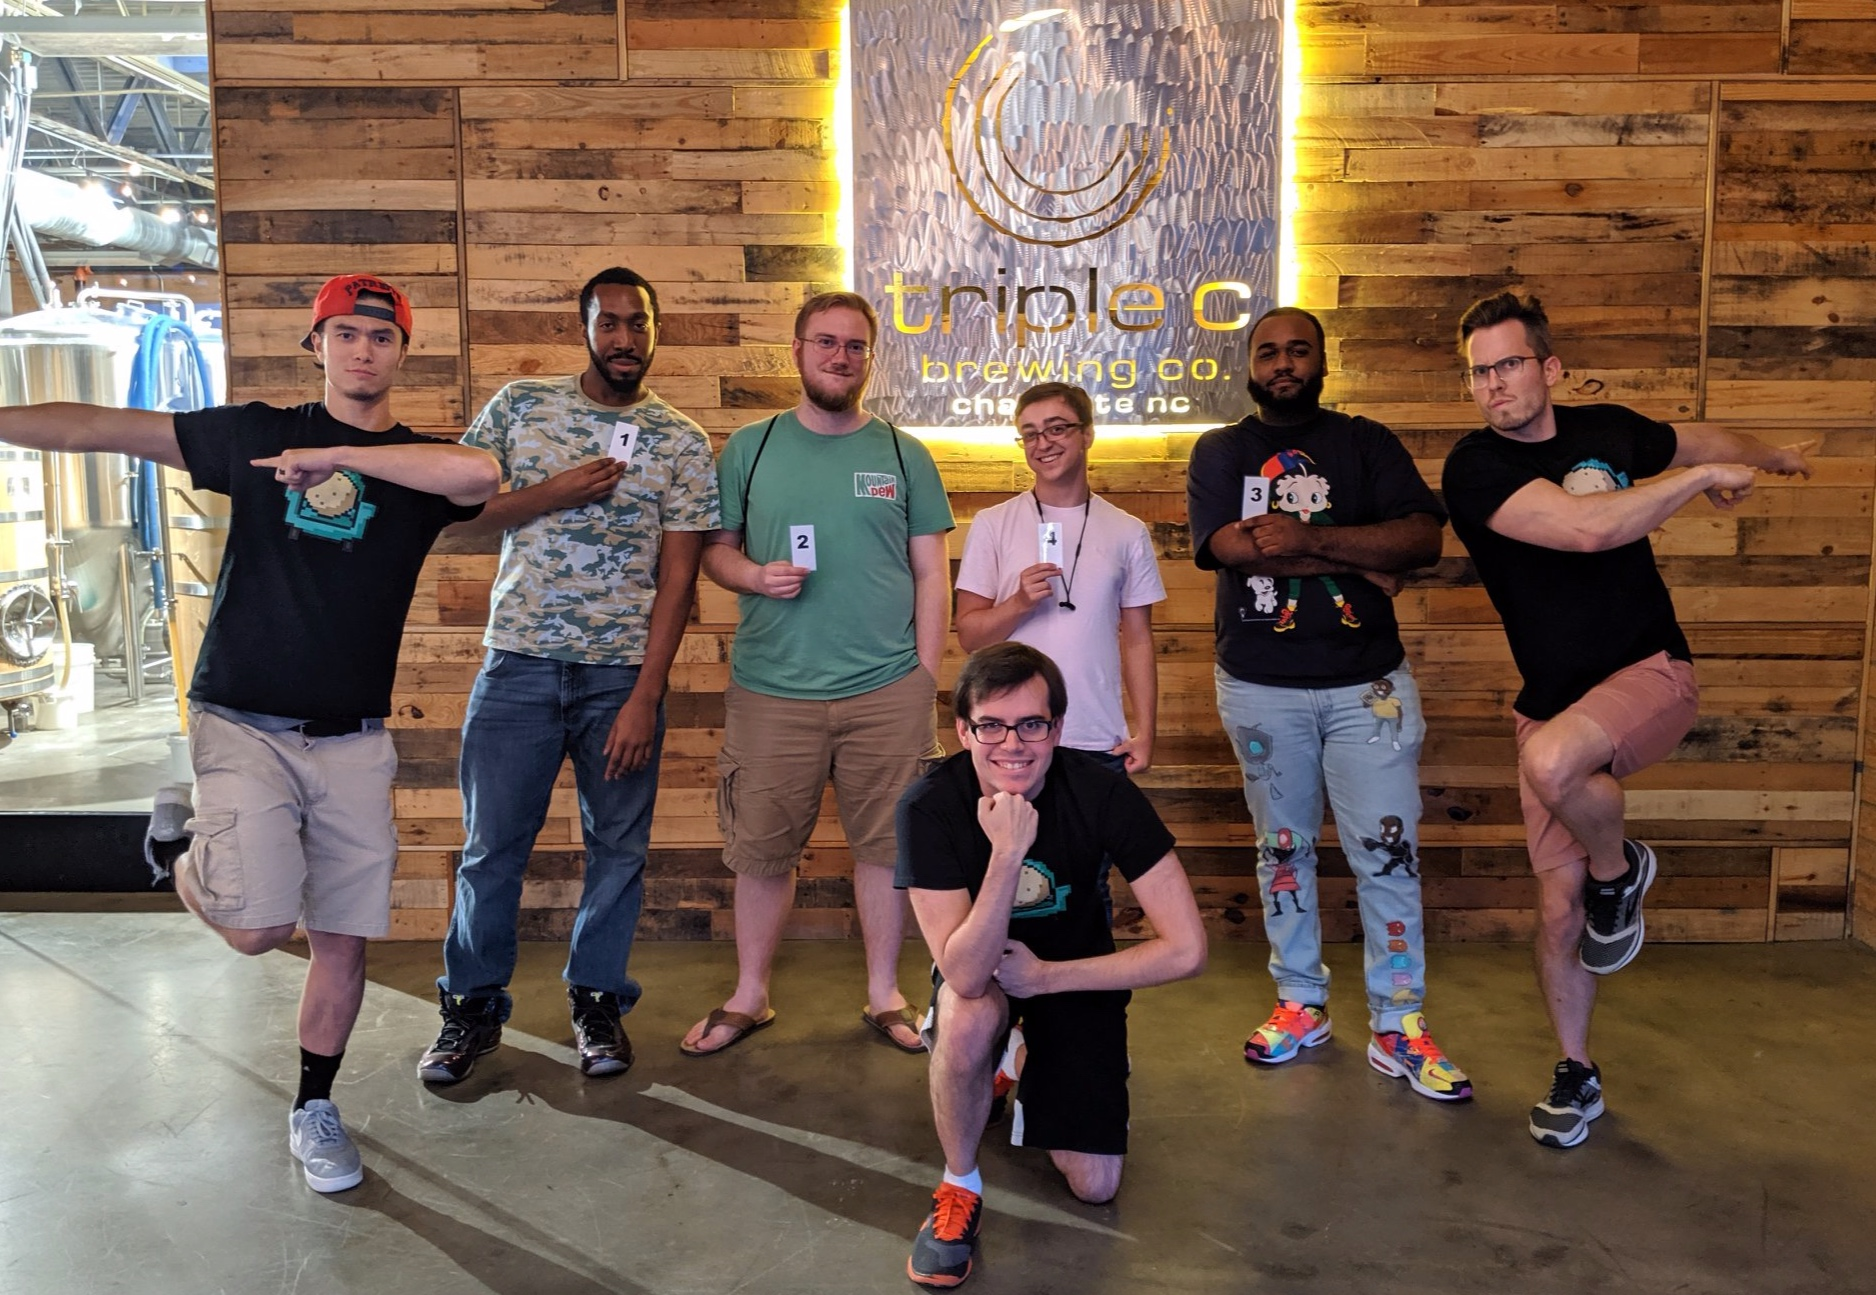 July 15th - Triple C Brewing Company Smash Ultimate Tournament Bracket - https://braacket.com/tournament/battlegrounds/